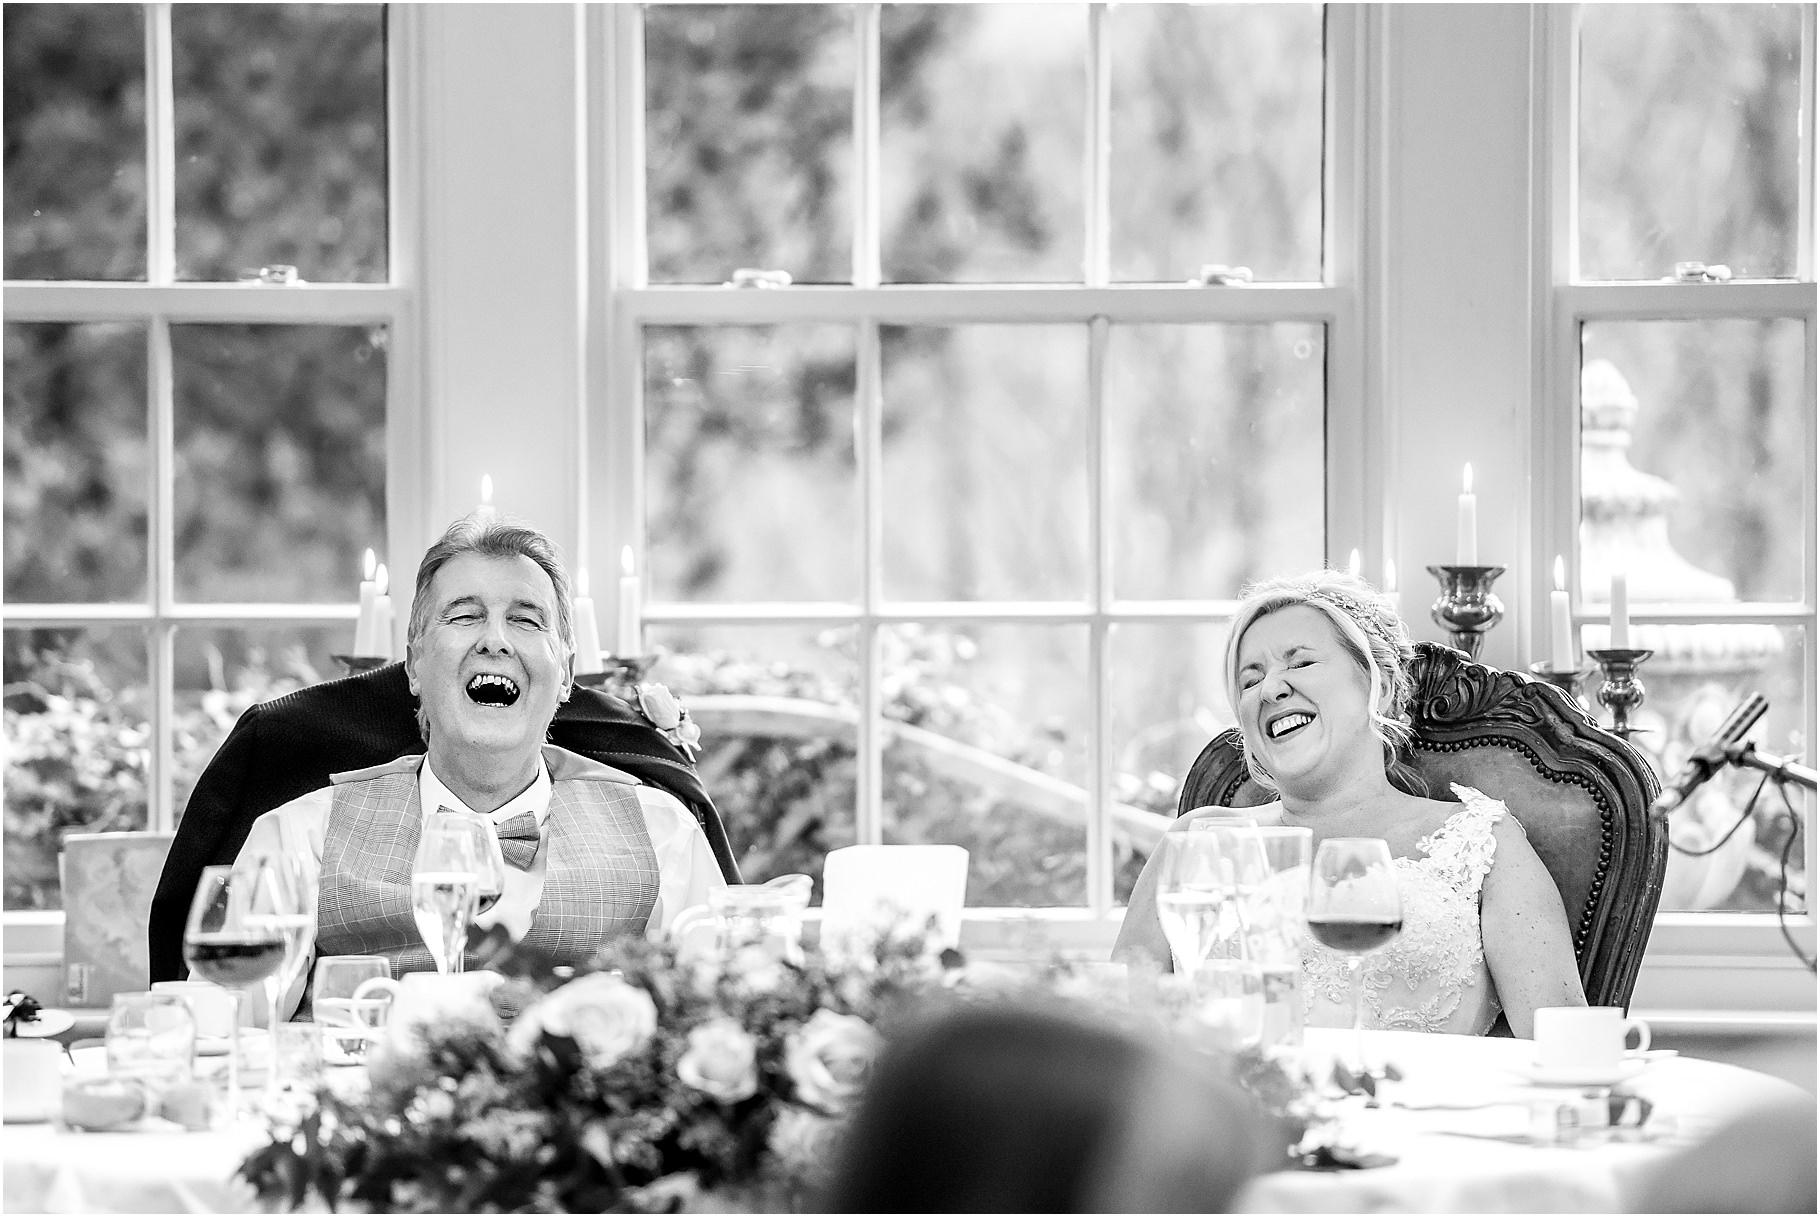 dan-wootton-photography-2017-weddings-113.jpg